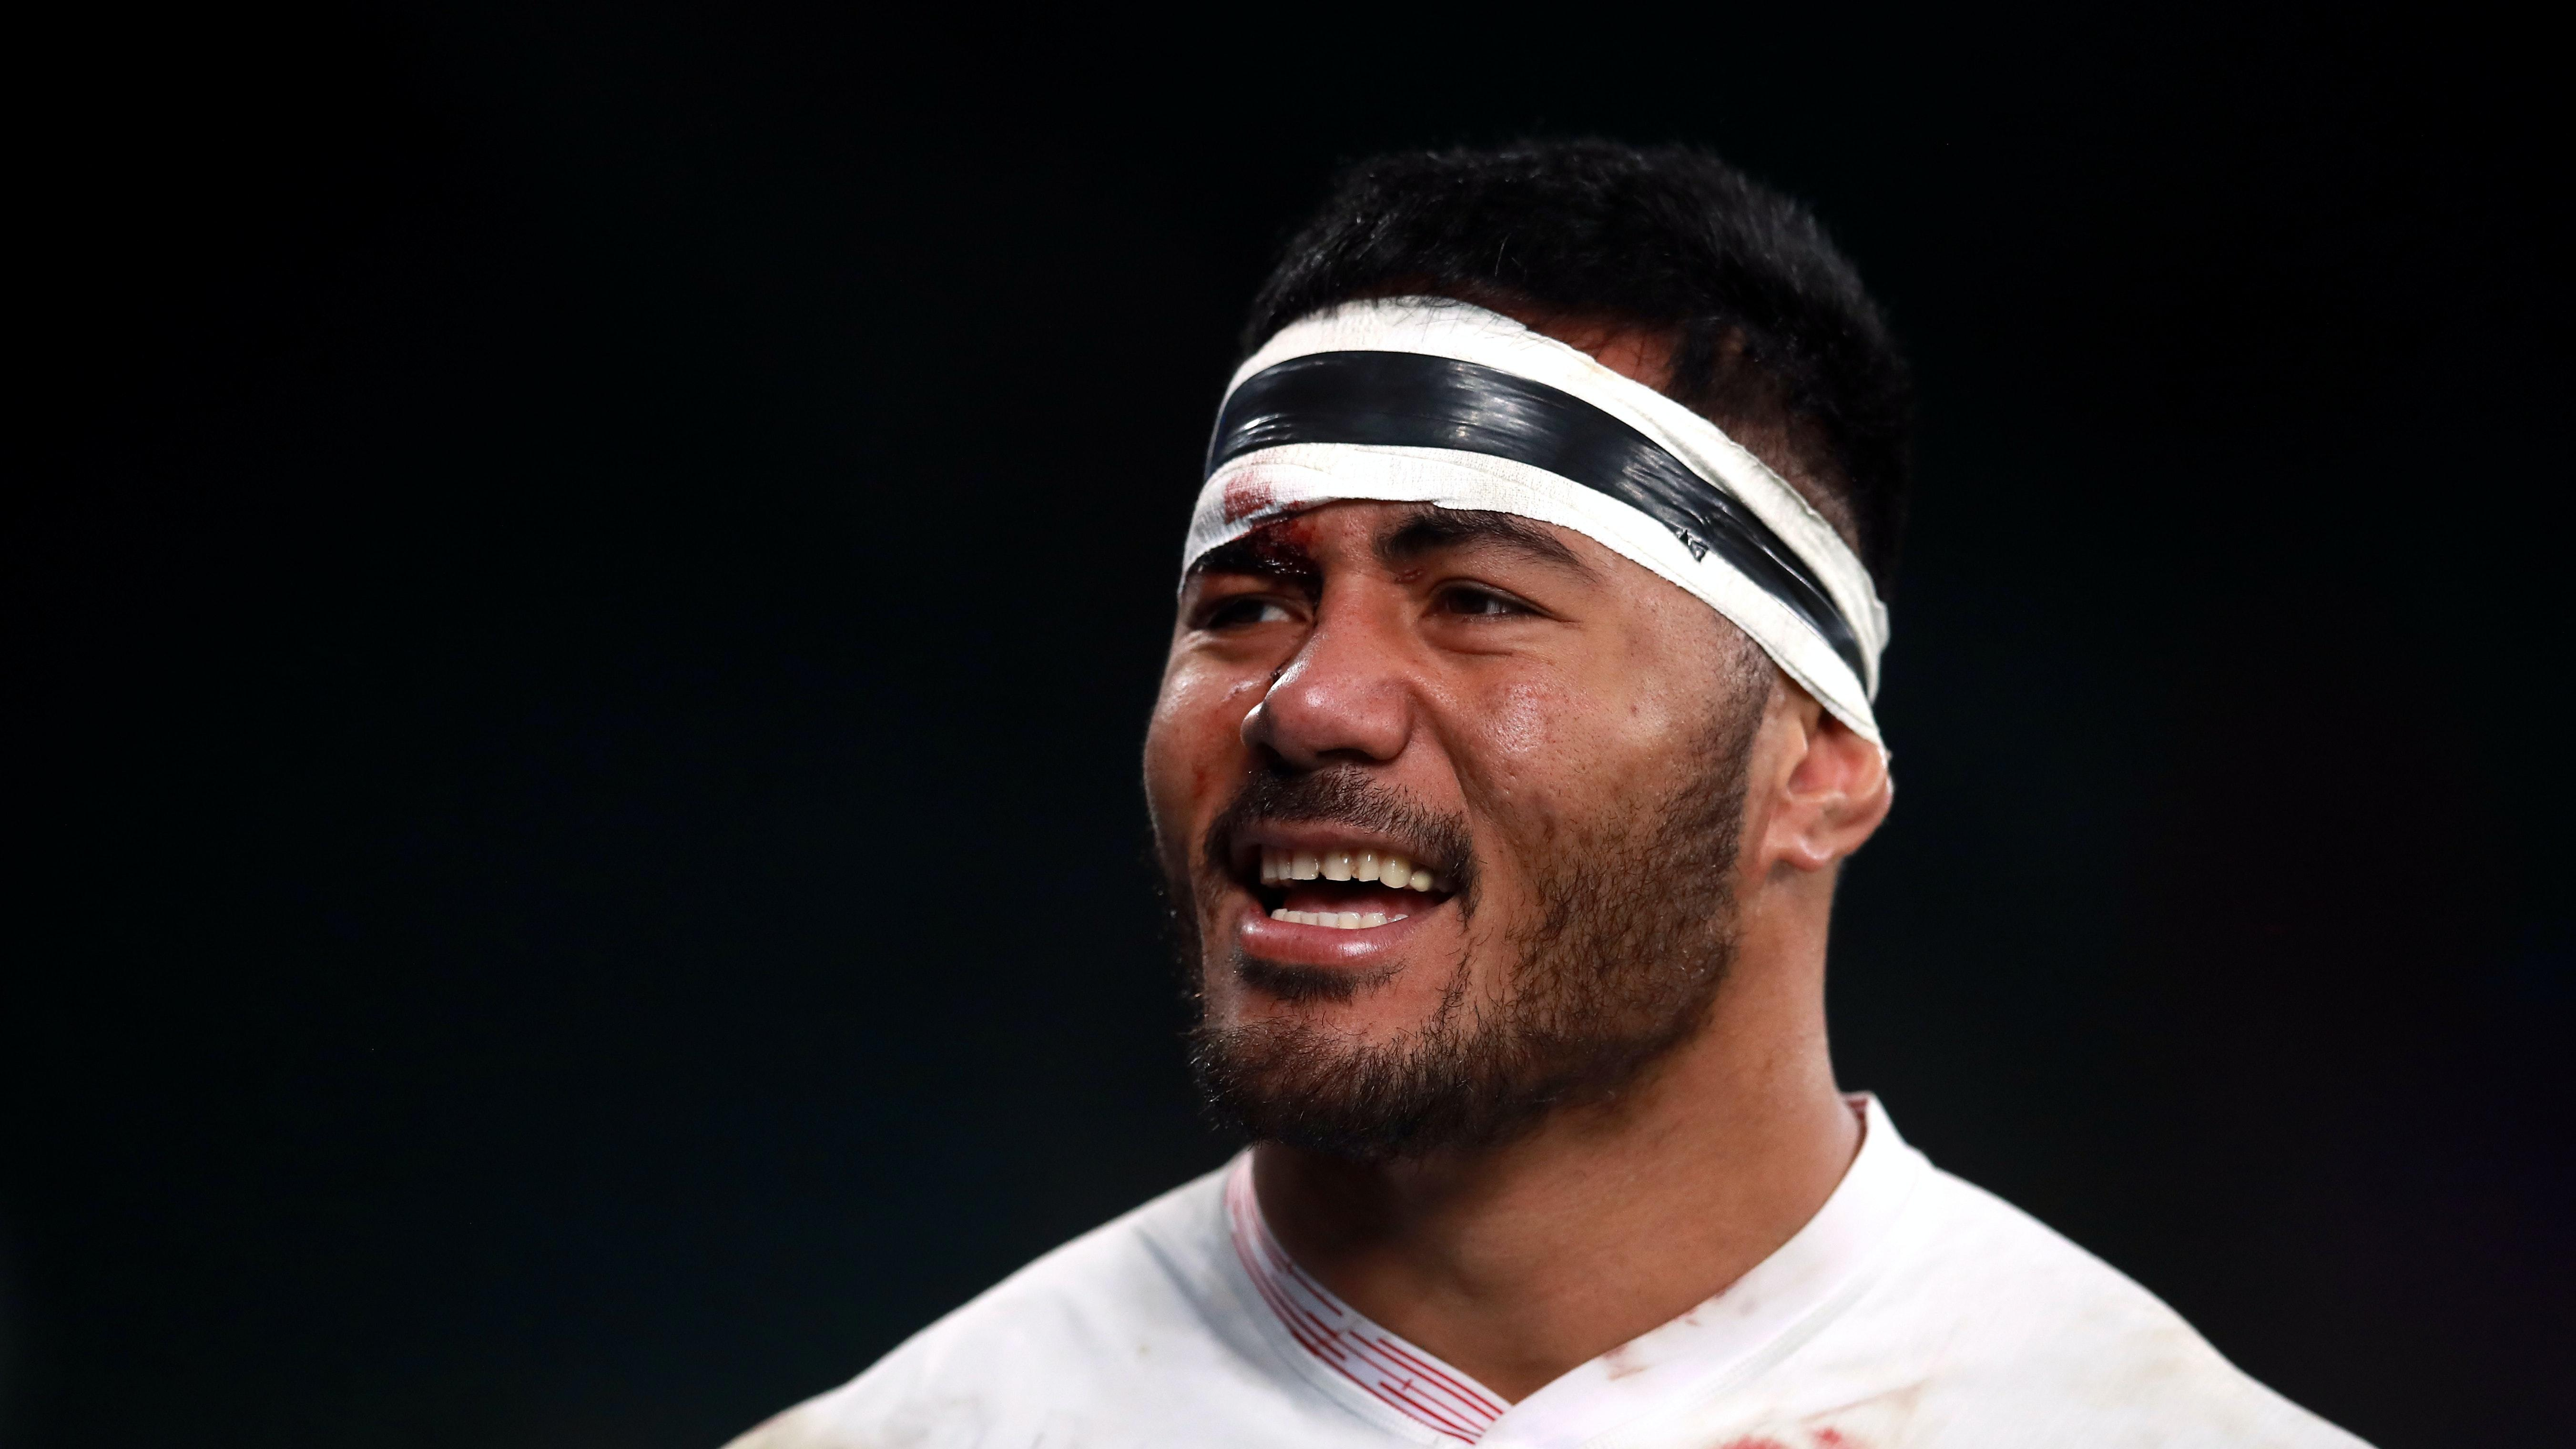 Manu Tuilagi completes move to Sale Sharks